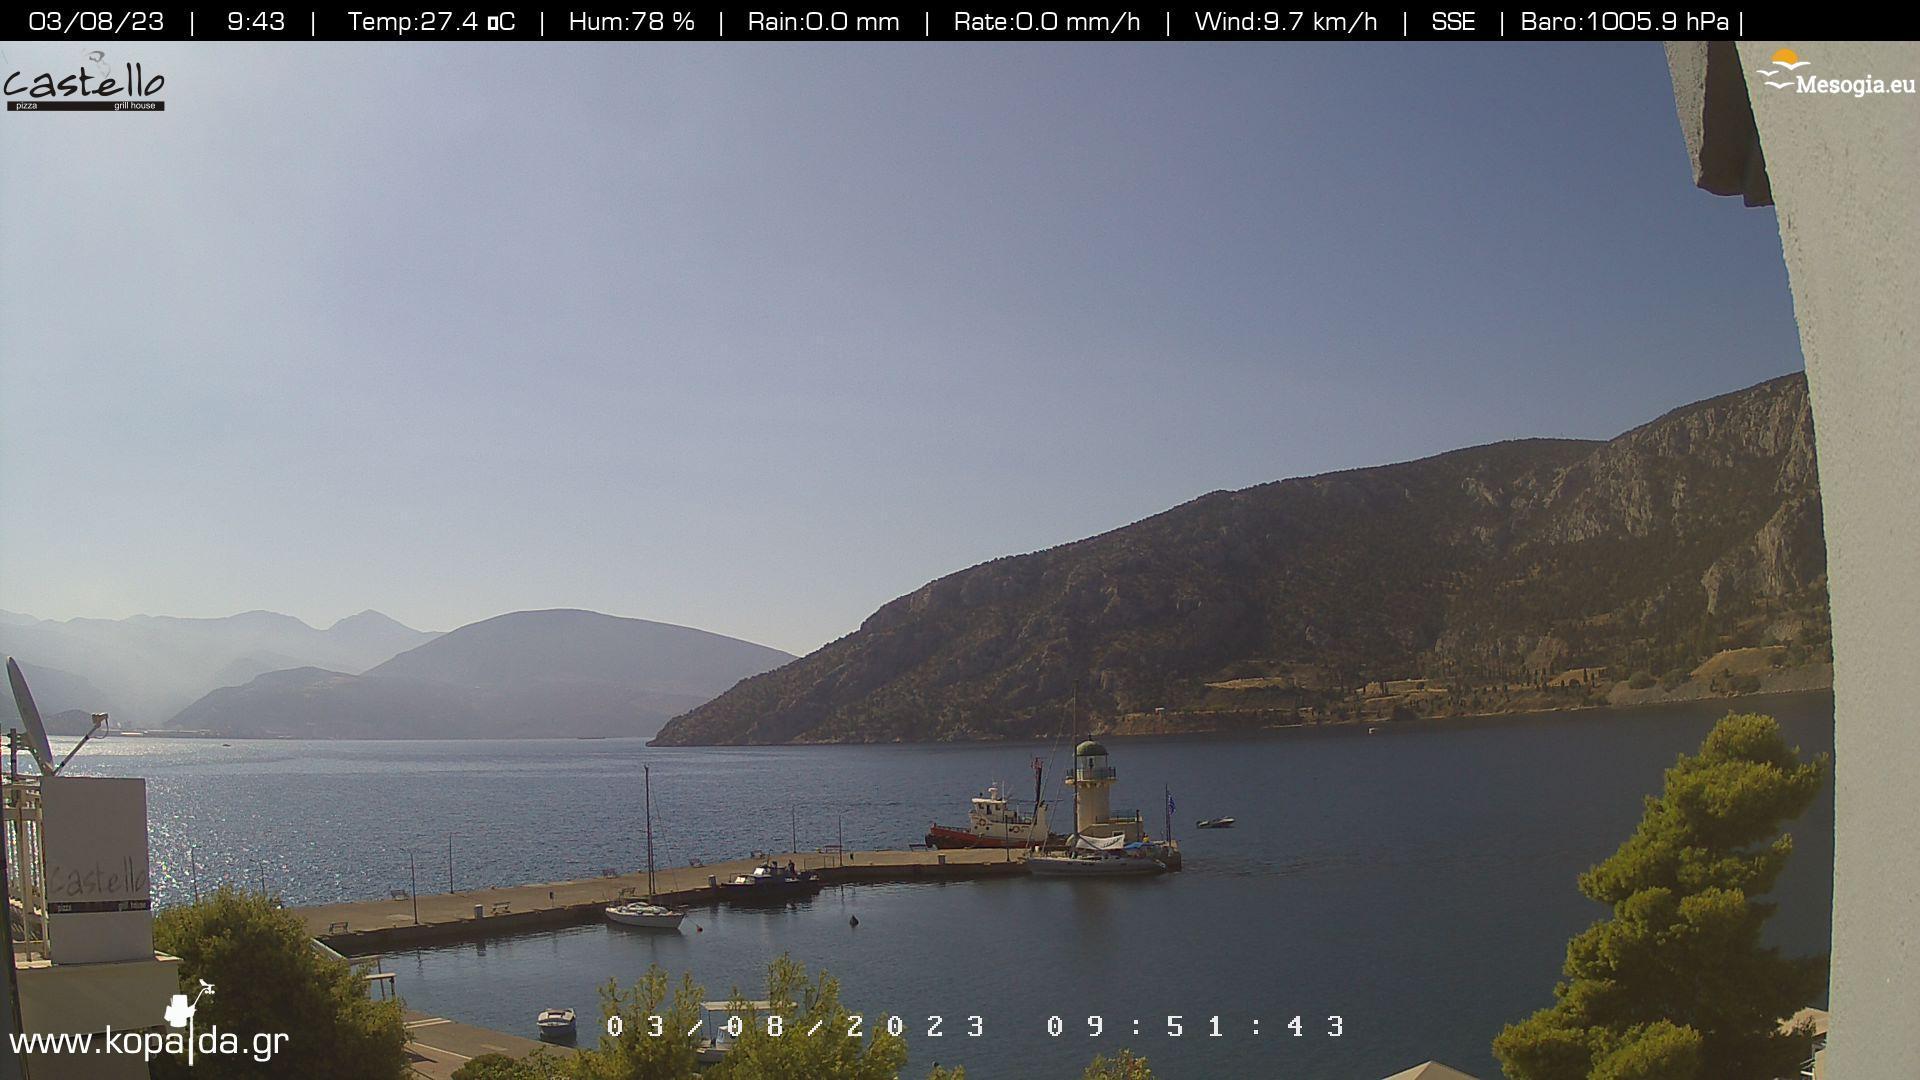 Webkamera Αντίκυρα: Antikyra − Central